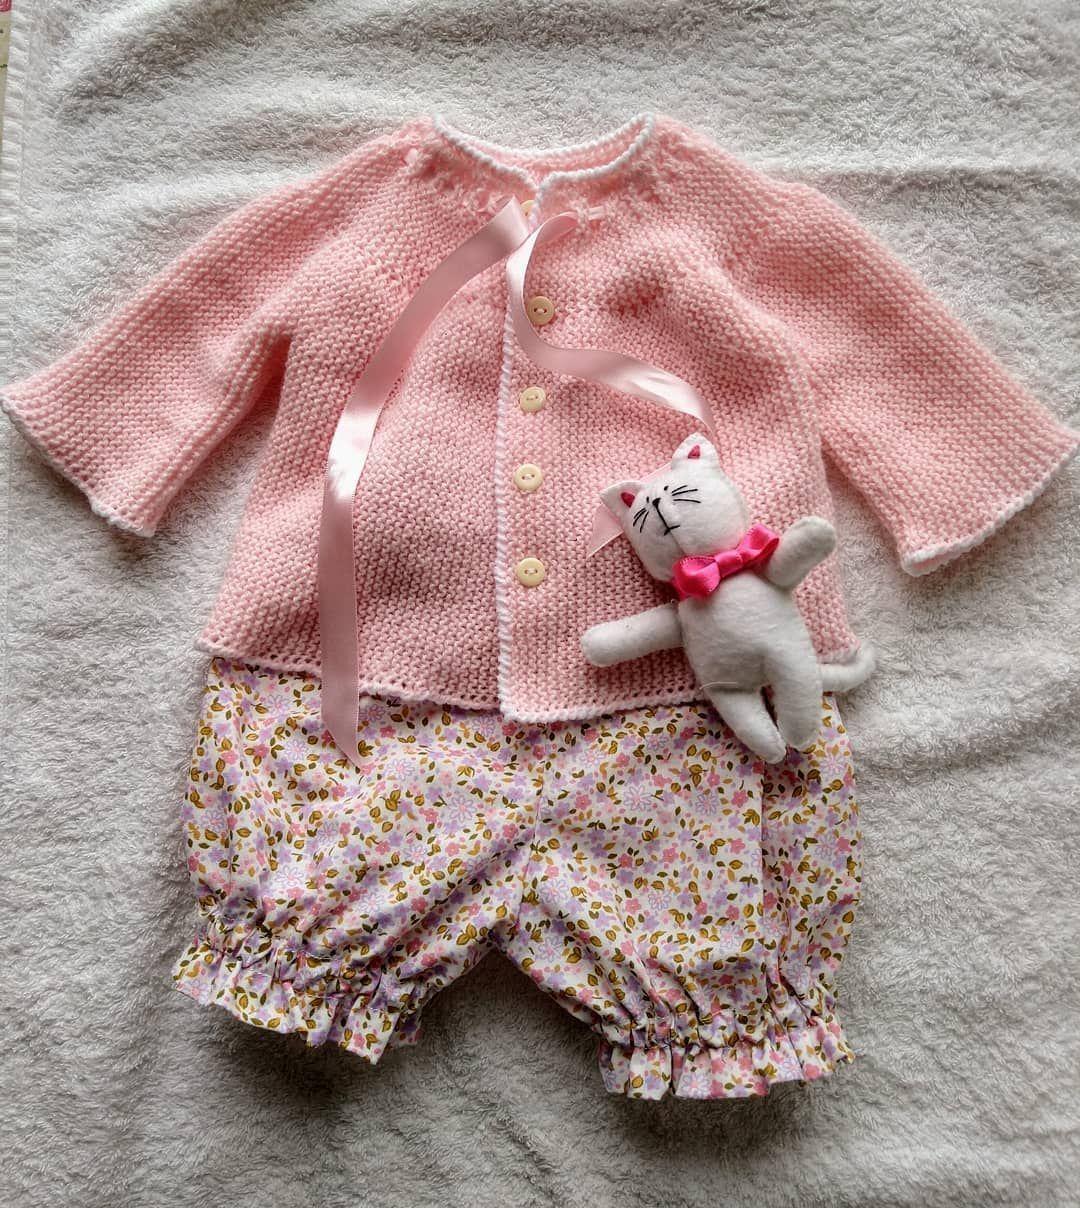 #boneca #bonecawaldorf #bonecadepano #doll #waldorfdoll #bambola #feltragem #needlefelt #poupée #dollsinstagran #collectabledolls #artdoll #dollmaker #handmade #dollsneedlefelt #boneca #bonecawaldorf #bonecadepano #doll #waldorfdoll #bambola #feltragem #needlefelt #poupée #dollsinstagran #collectabledolls #artdoll #dollmaker #handmade #dollsneedlefelt #boneca #bonecawaldorf #bonecadepano #doll #waldorfdoll #bambola #feltragem #needlefelt #poupée #dollsinstagran #collectabledolls #artdoll #dol #dollsneedlefelt